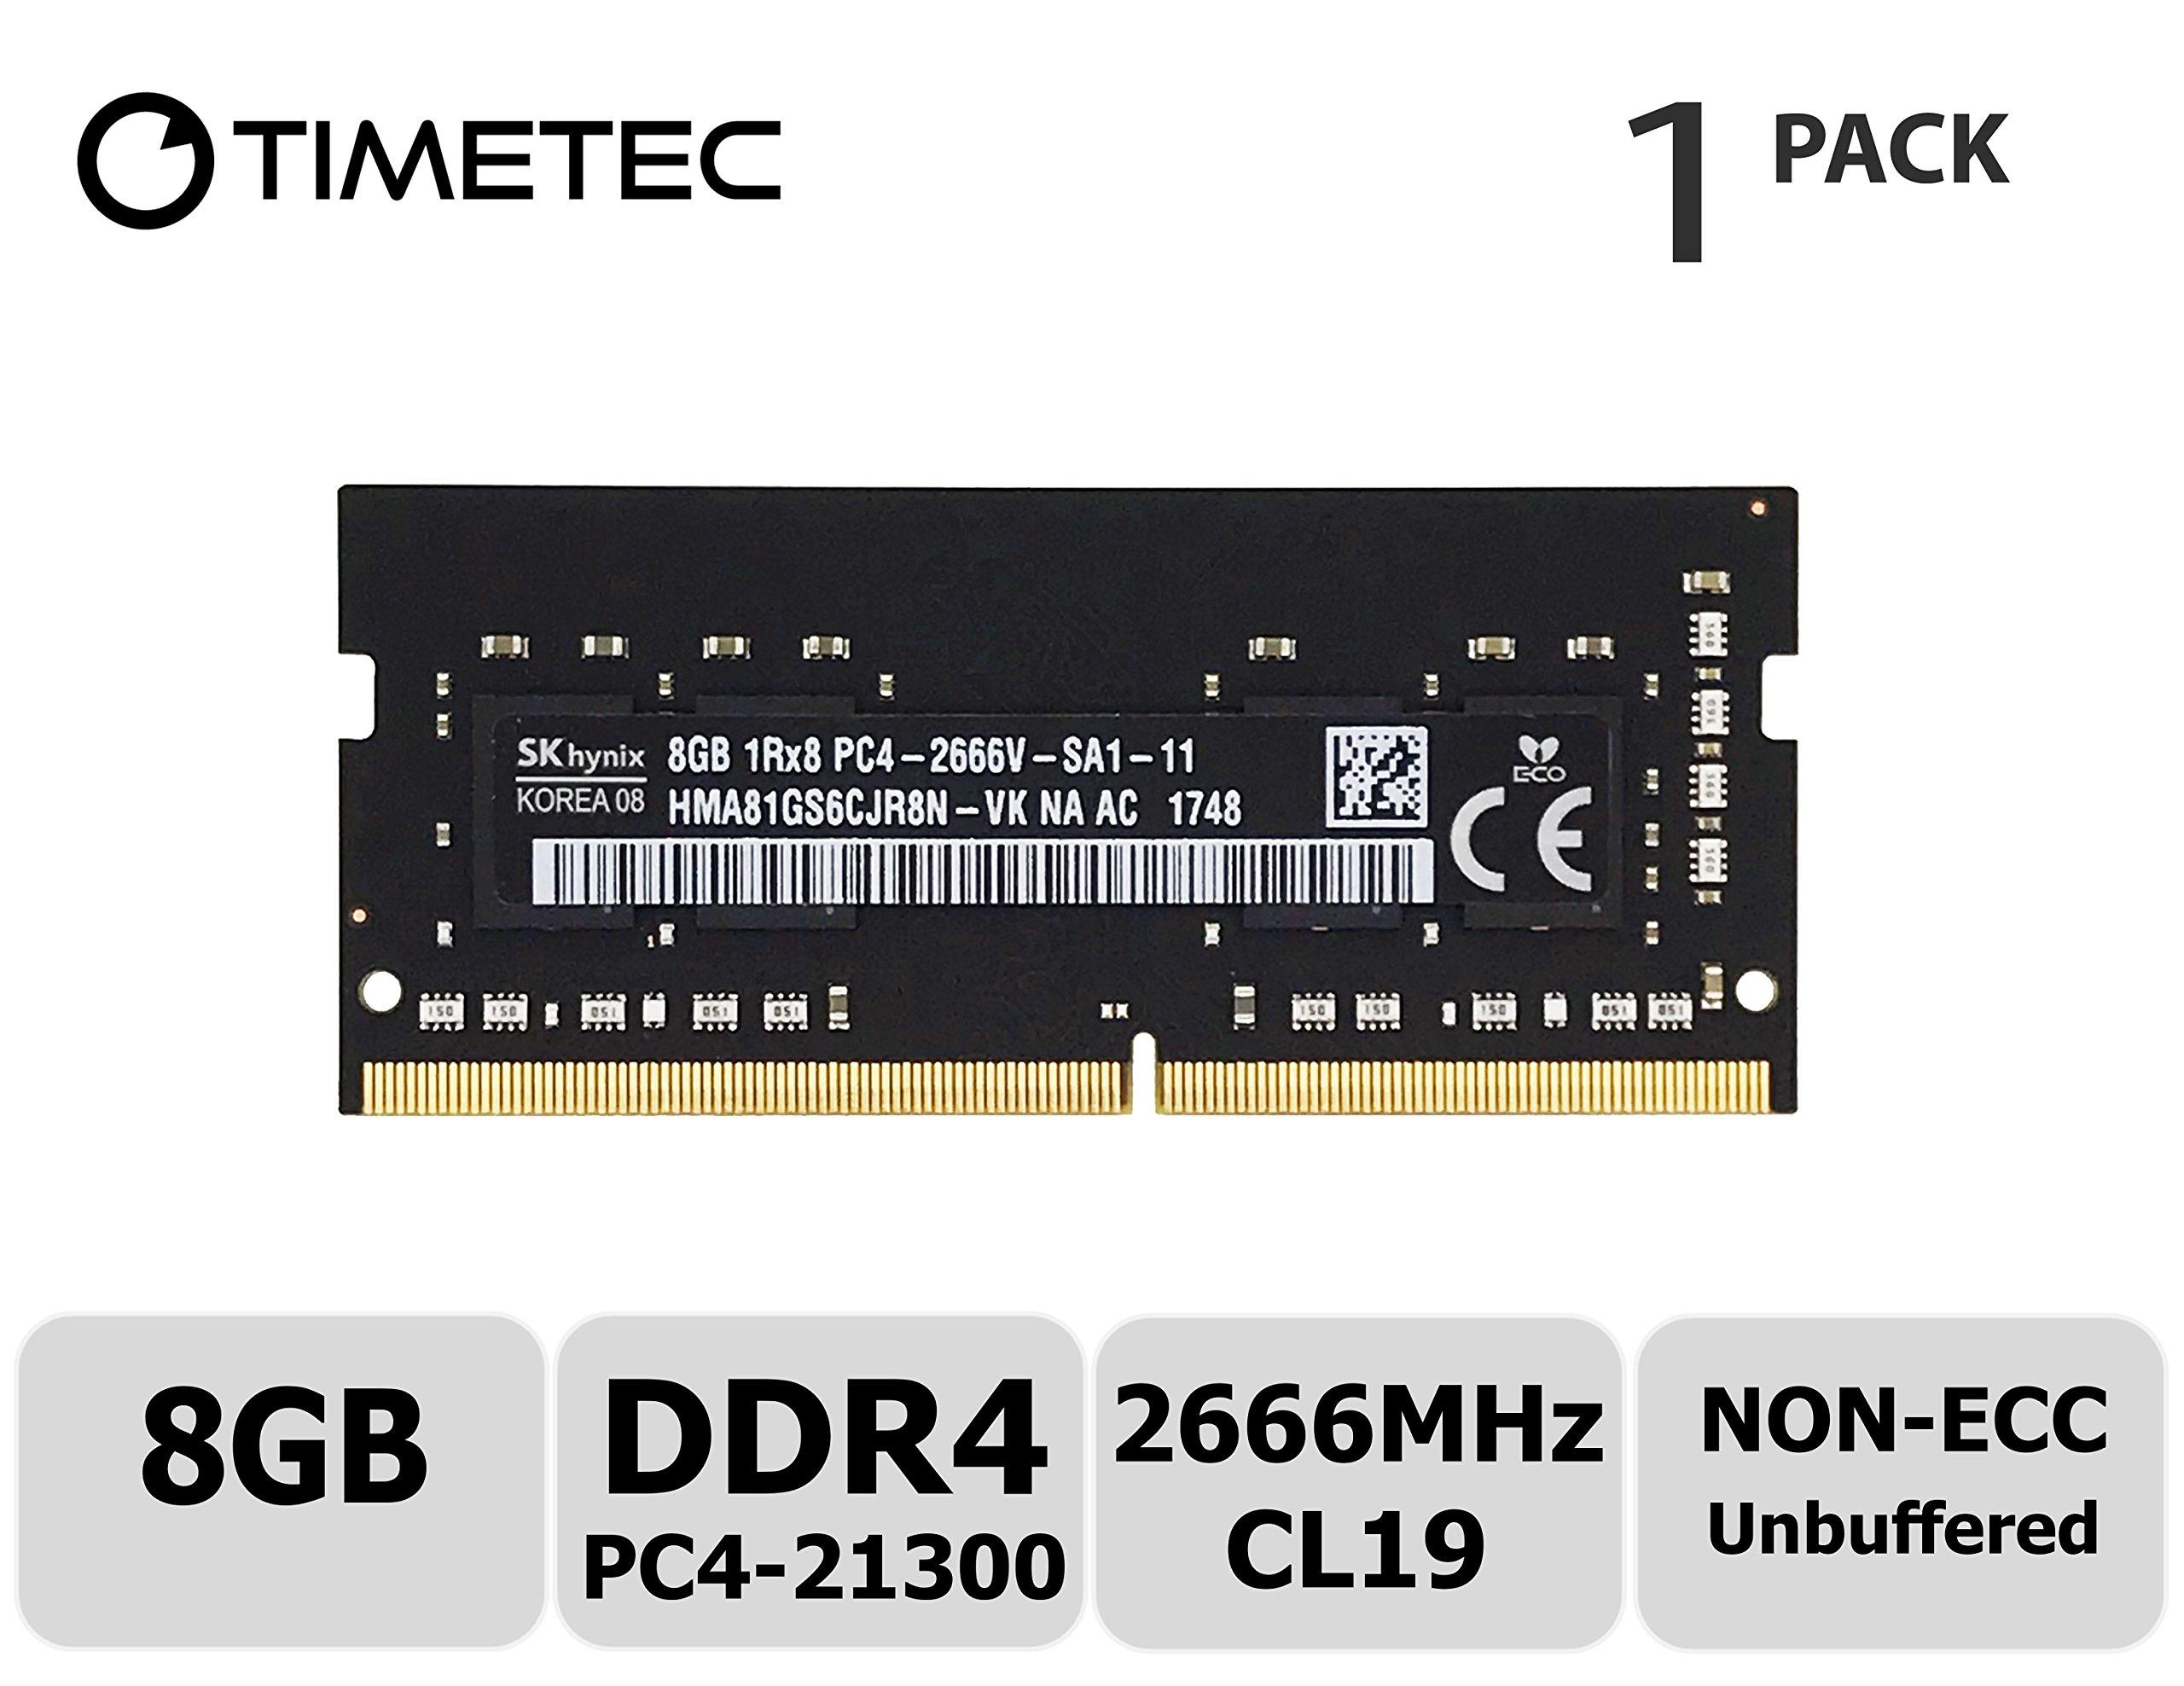 Timetec Hynix 8GB DDR4 2666MHz PC4-21300 Unbuffered Non-ECC 1.2V CL19 1Rx8 Single Rank 260 Pin SODIMM Laptop Notebook Computer Memory RAM Module Upgrade (8GB)